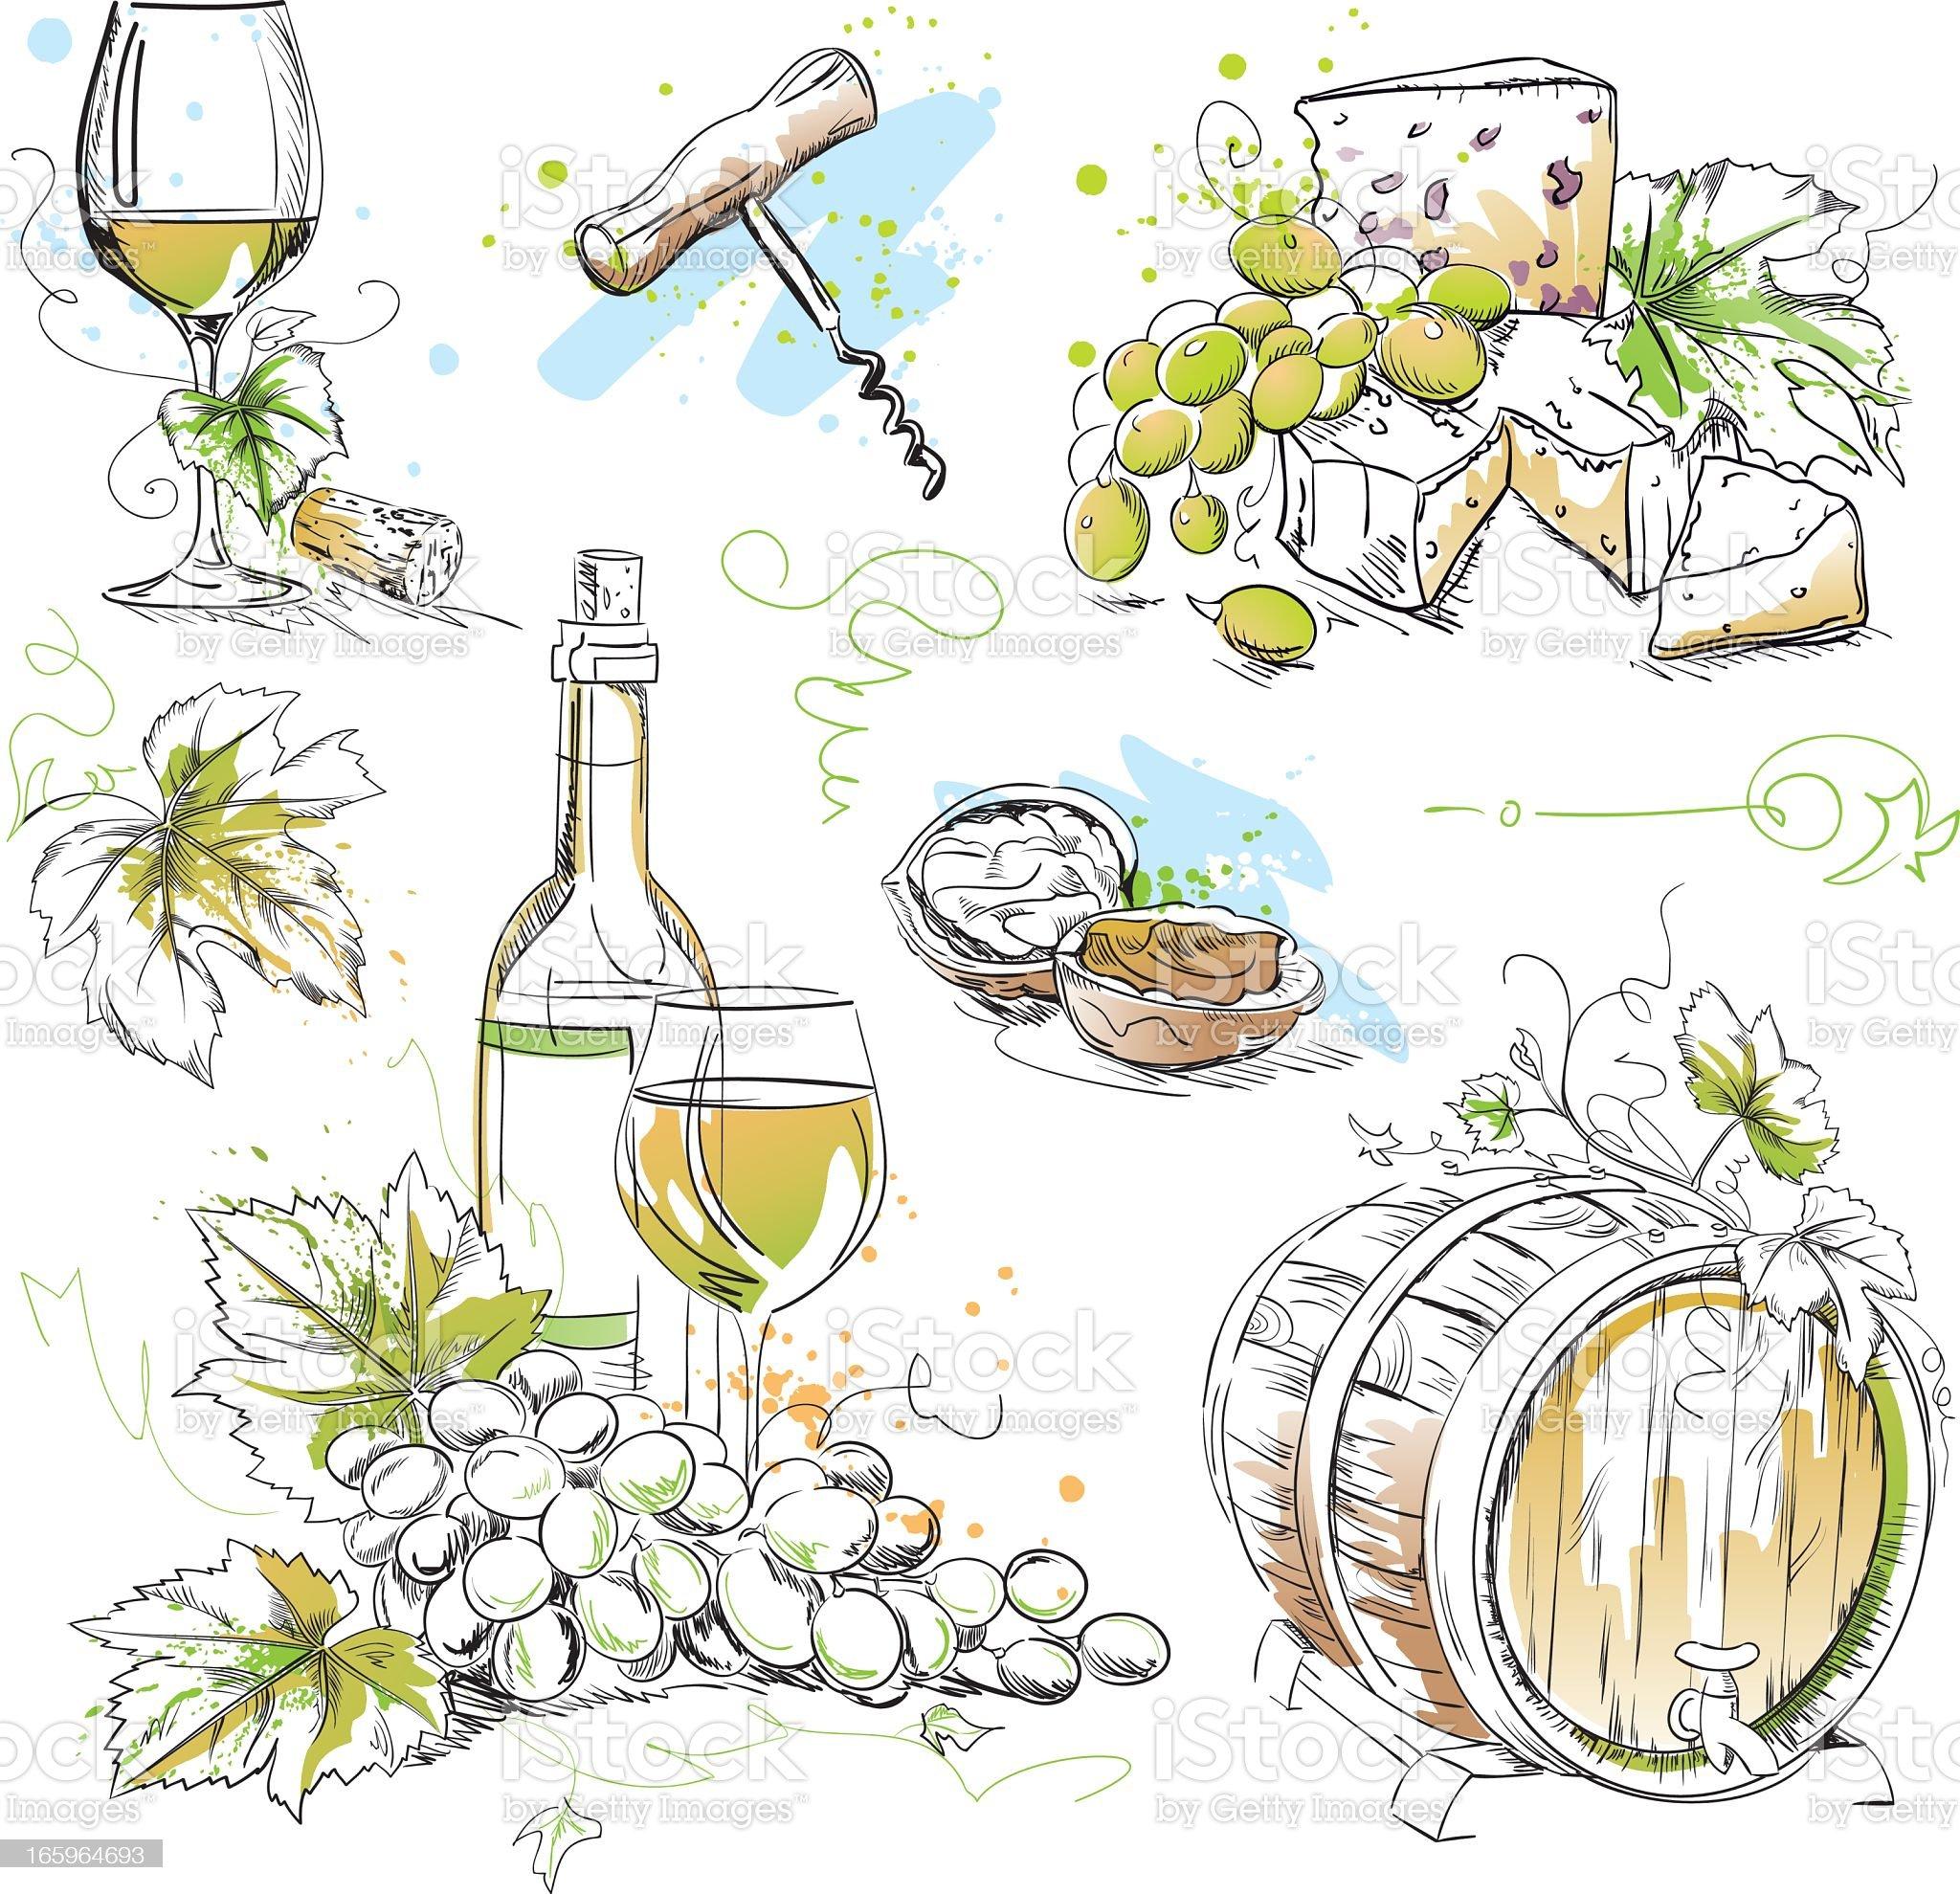 White Wine Tasting Drawings royalty-free stock vector art